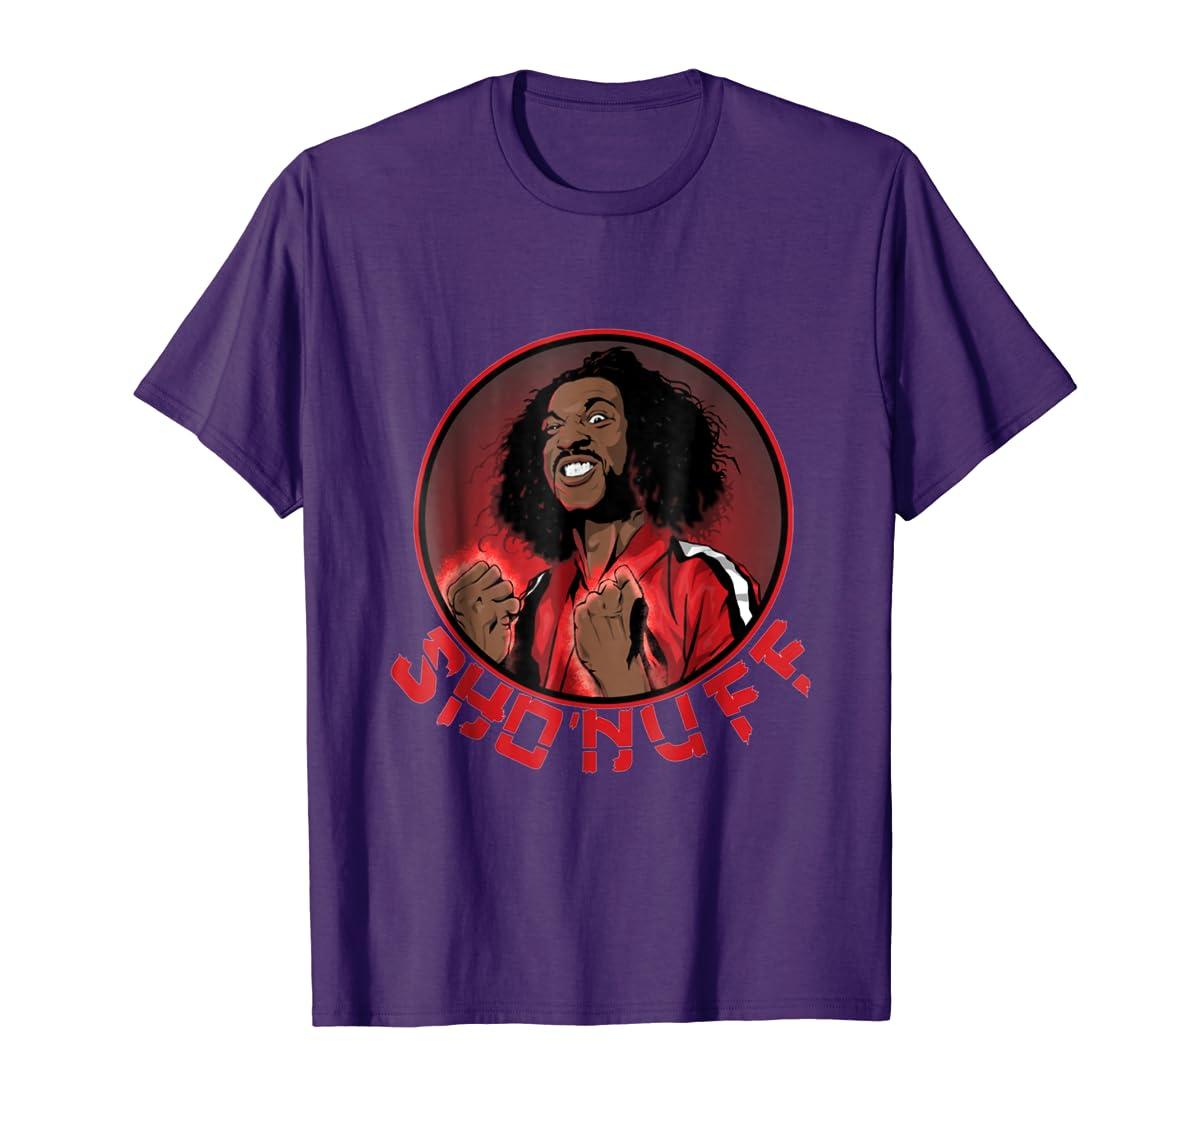 Shon uff shogun of harlem T Shirt-Men's T-Shirt-Purple